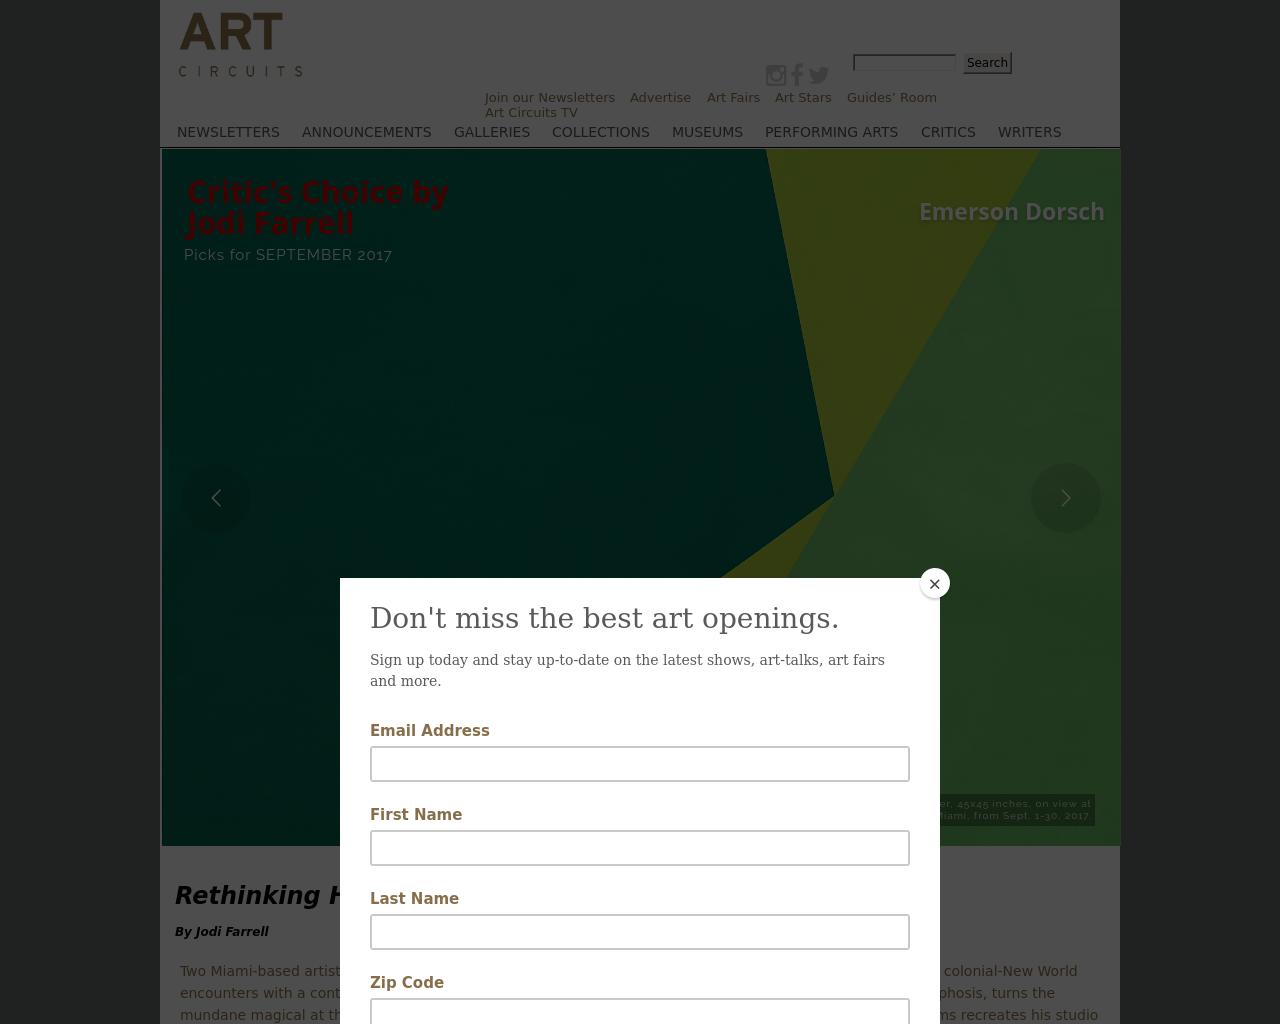 Art-Circuits-Advertising-Reviews-Pricing